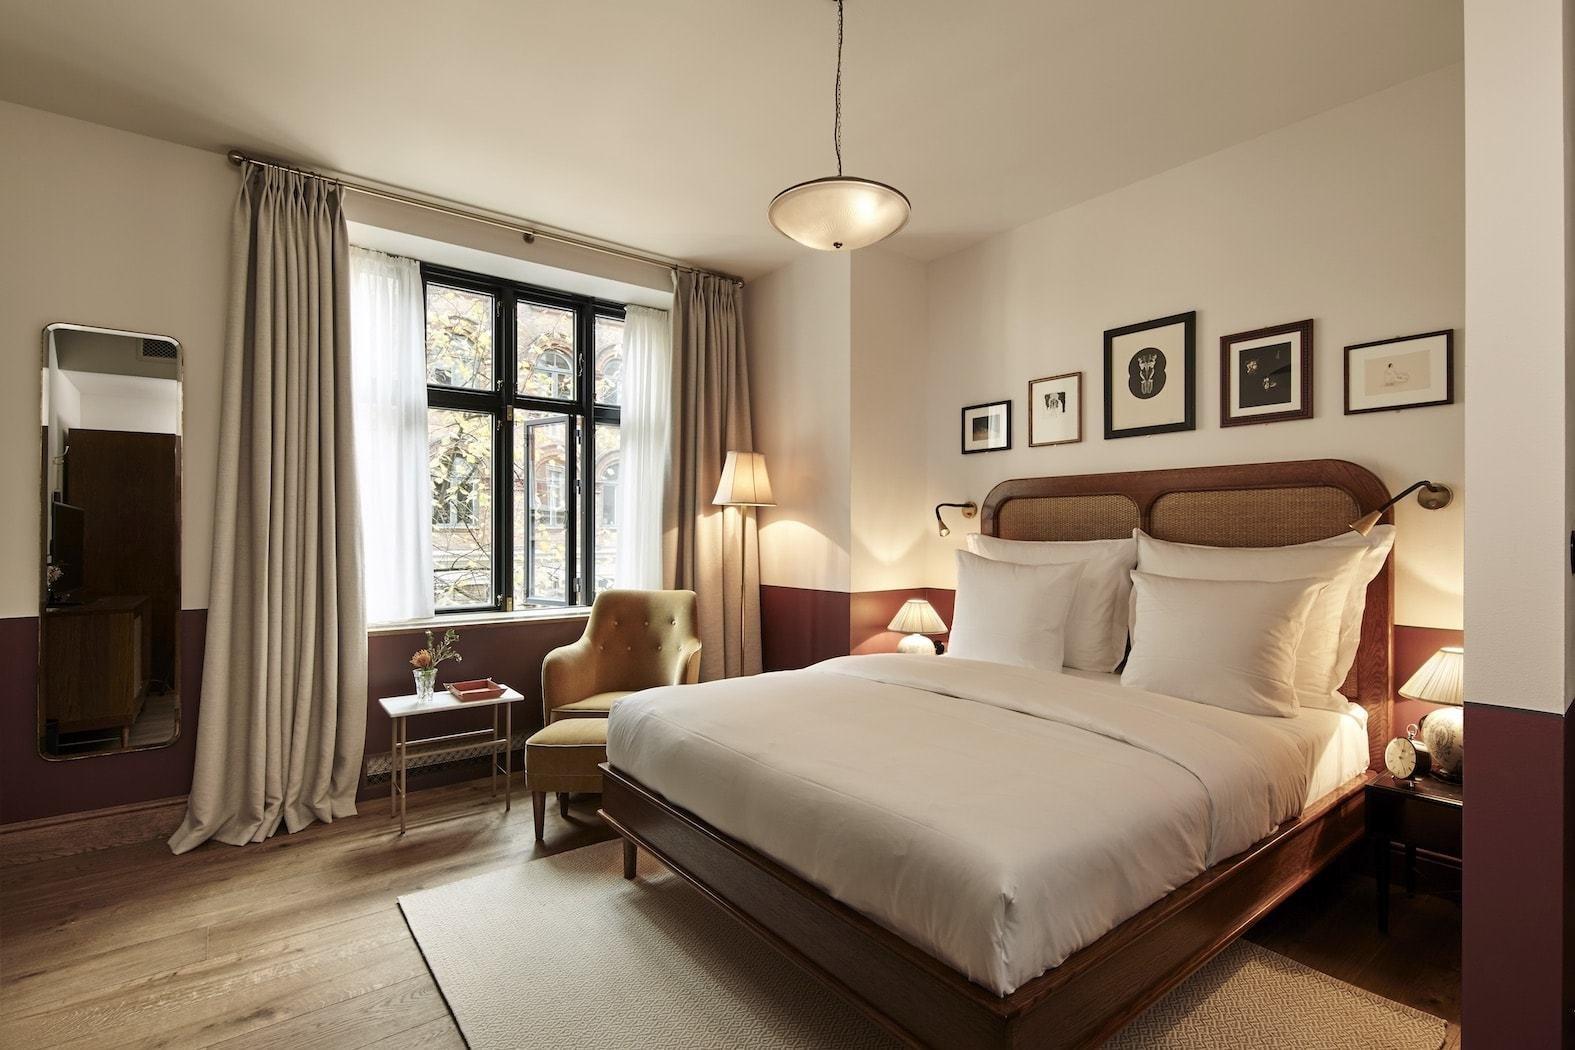 Bedroom, Table Lighting, Floor Lighting, Night Stands, Wall Lighting, Pendant Lighting, Medium Hardwood Floor, Chair, Rug Floor, and Bed  Hotel Sanders